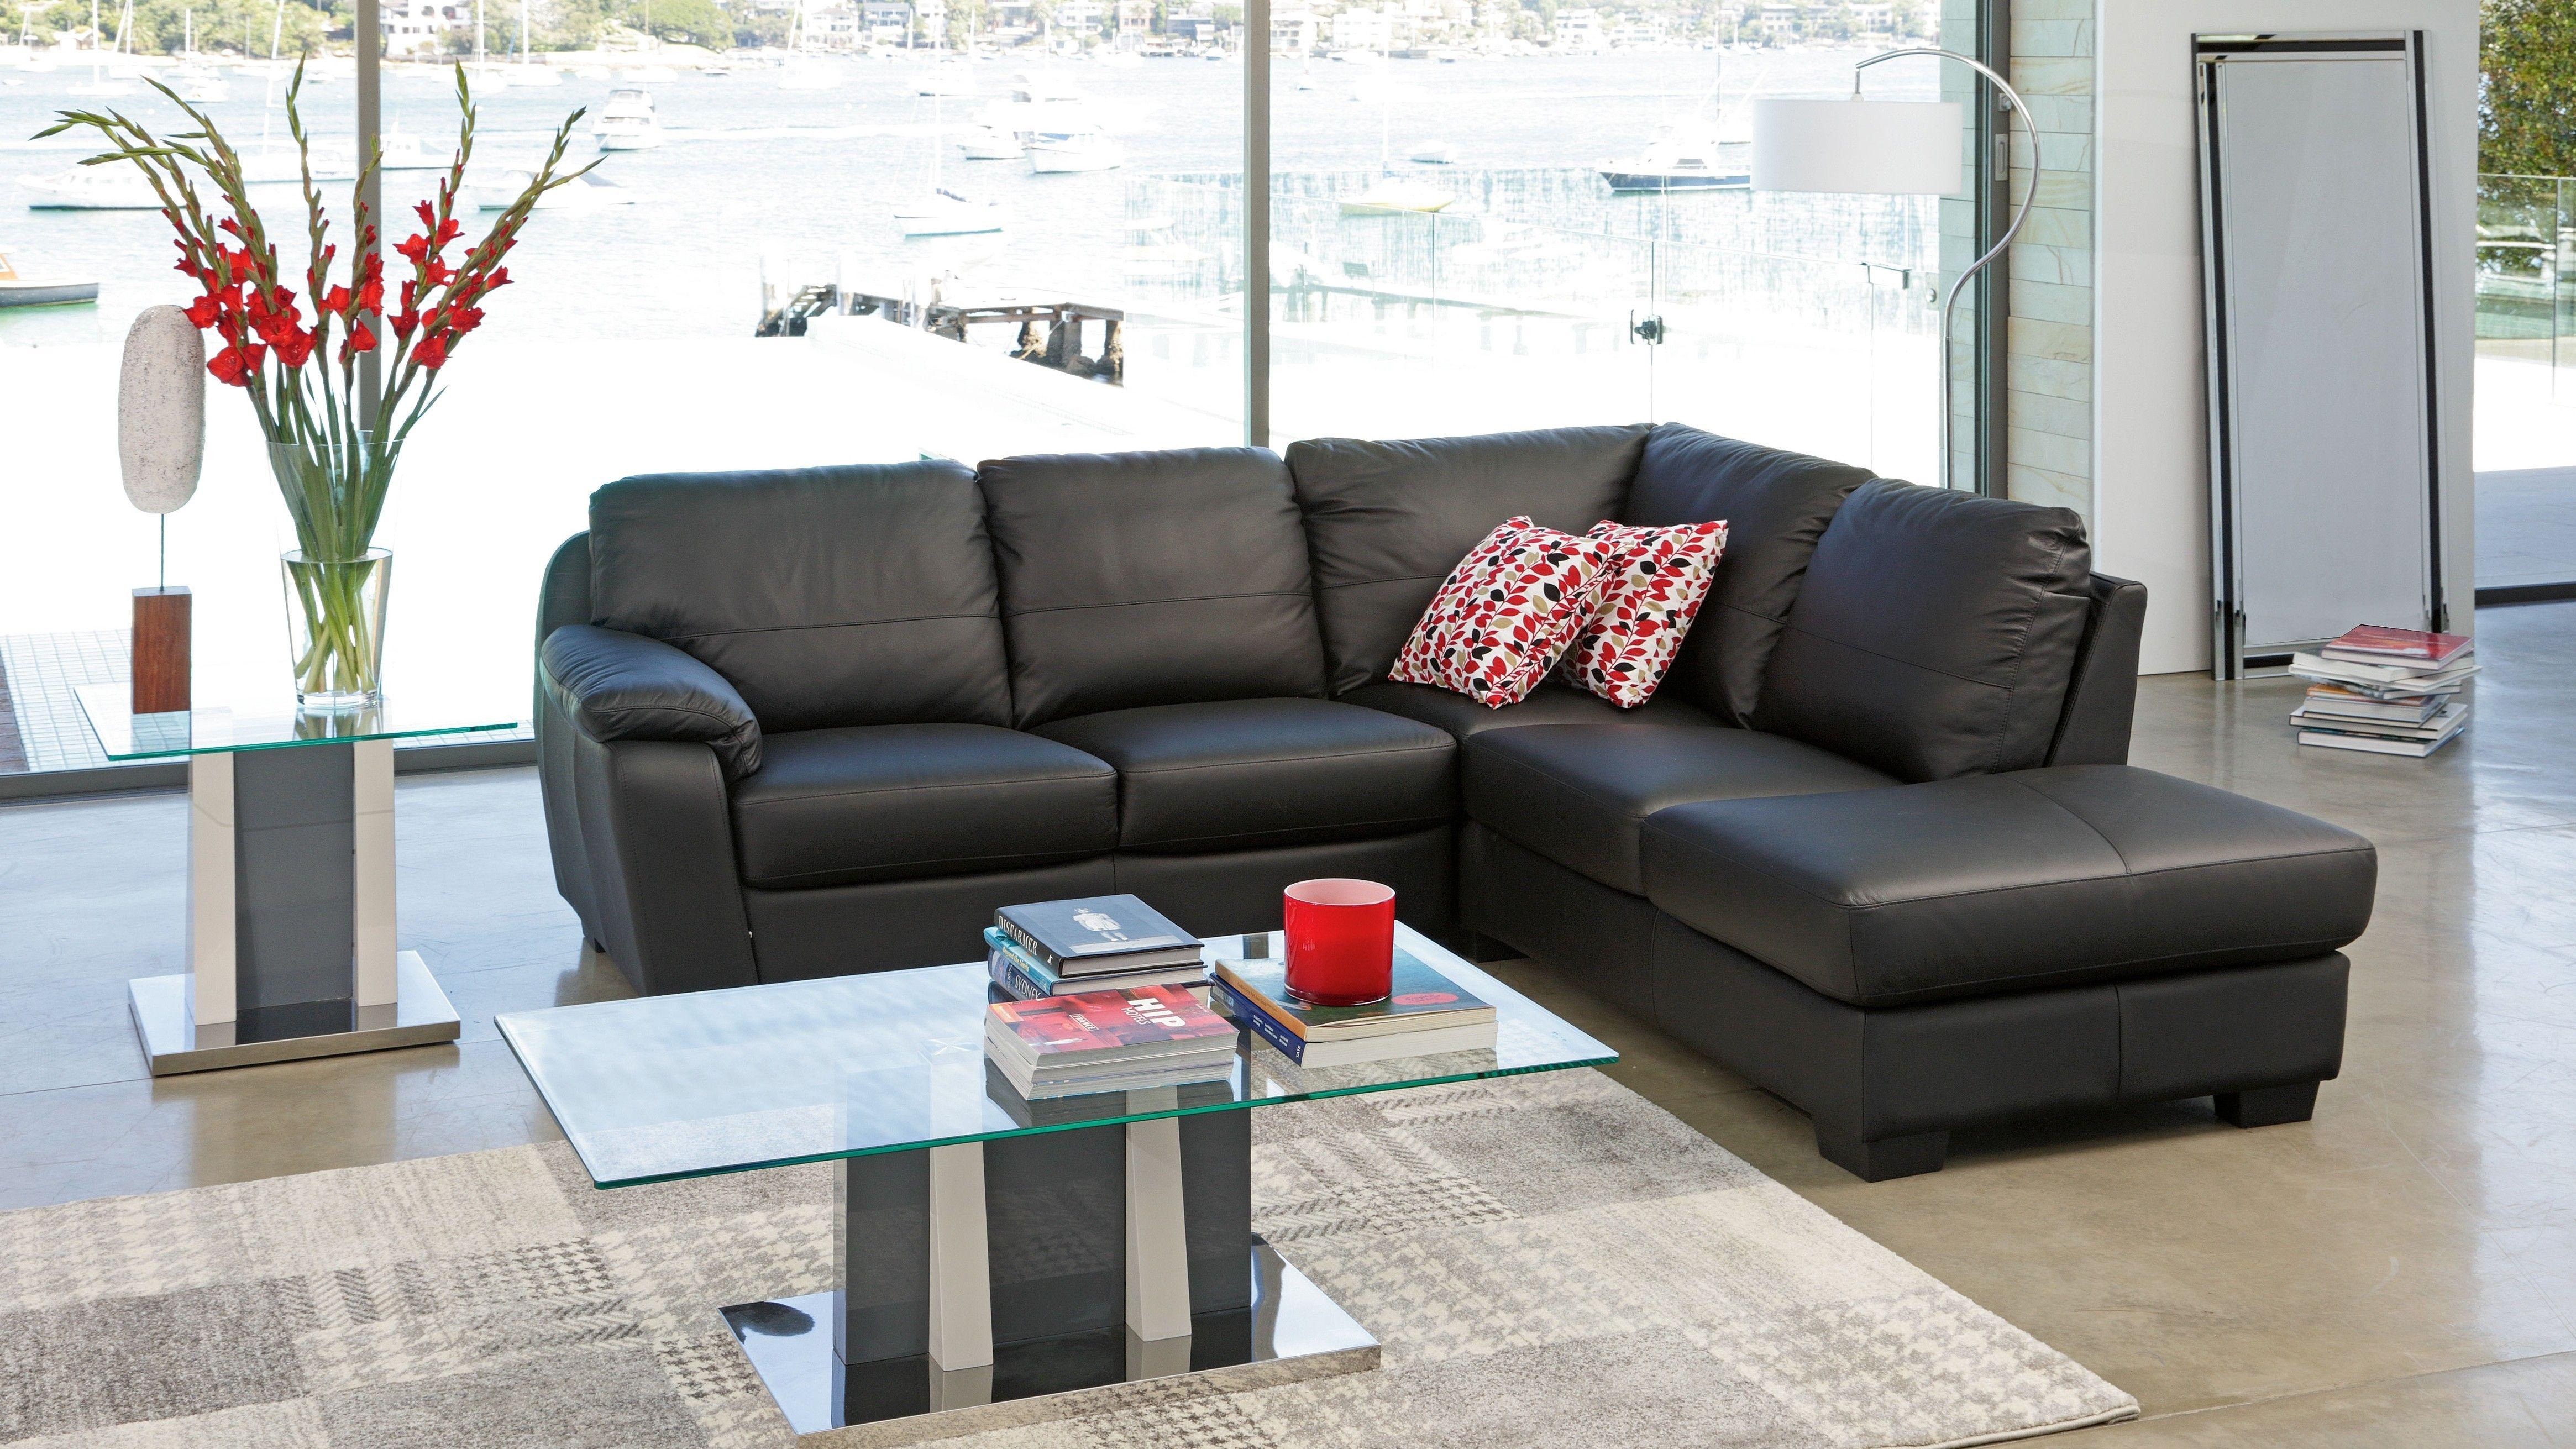 Cool Lounge Suite Ideas Photos - Best interior design - buywine.us ...